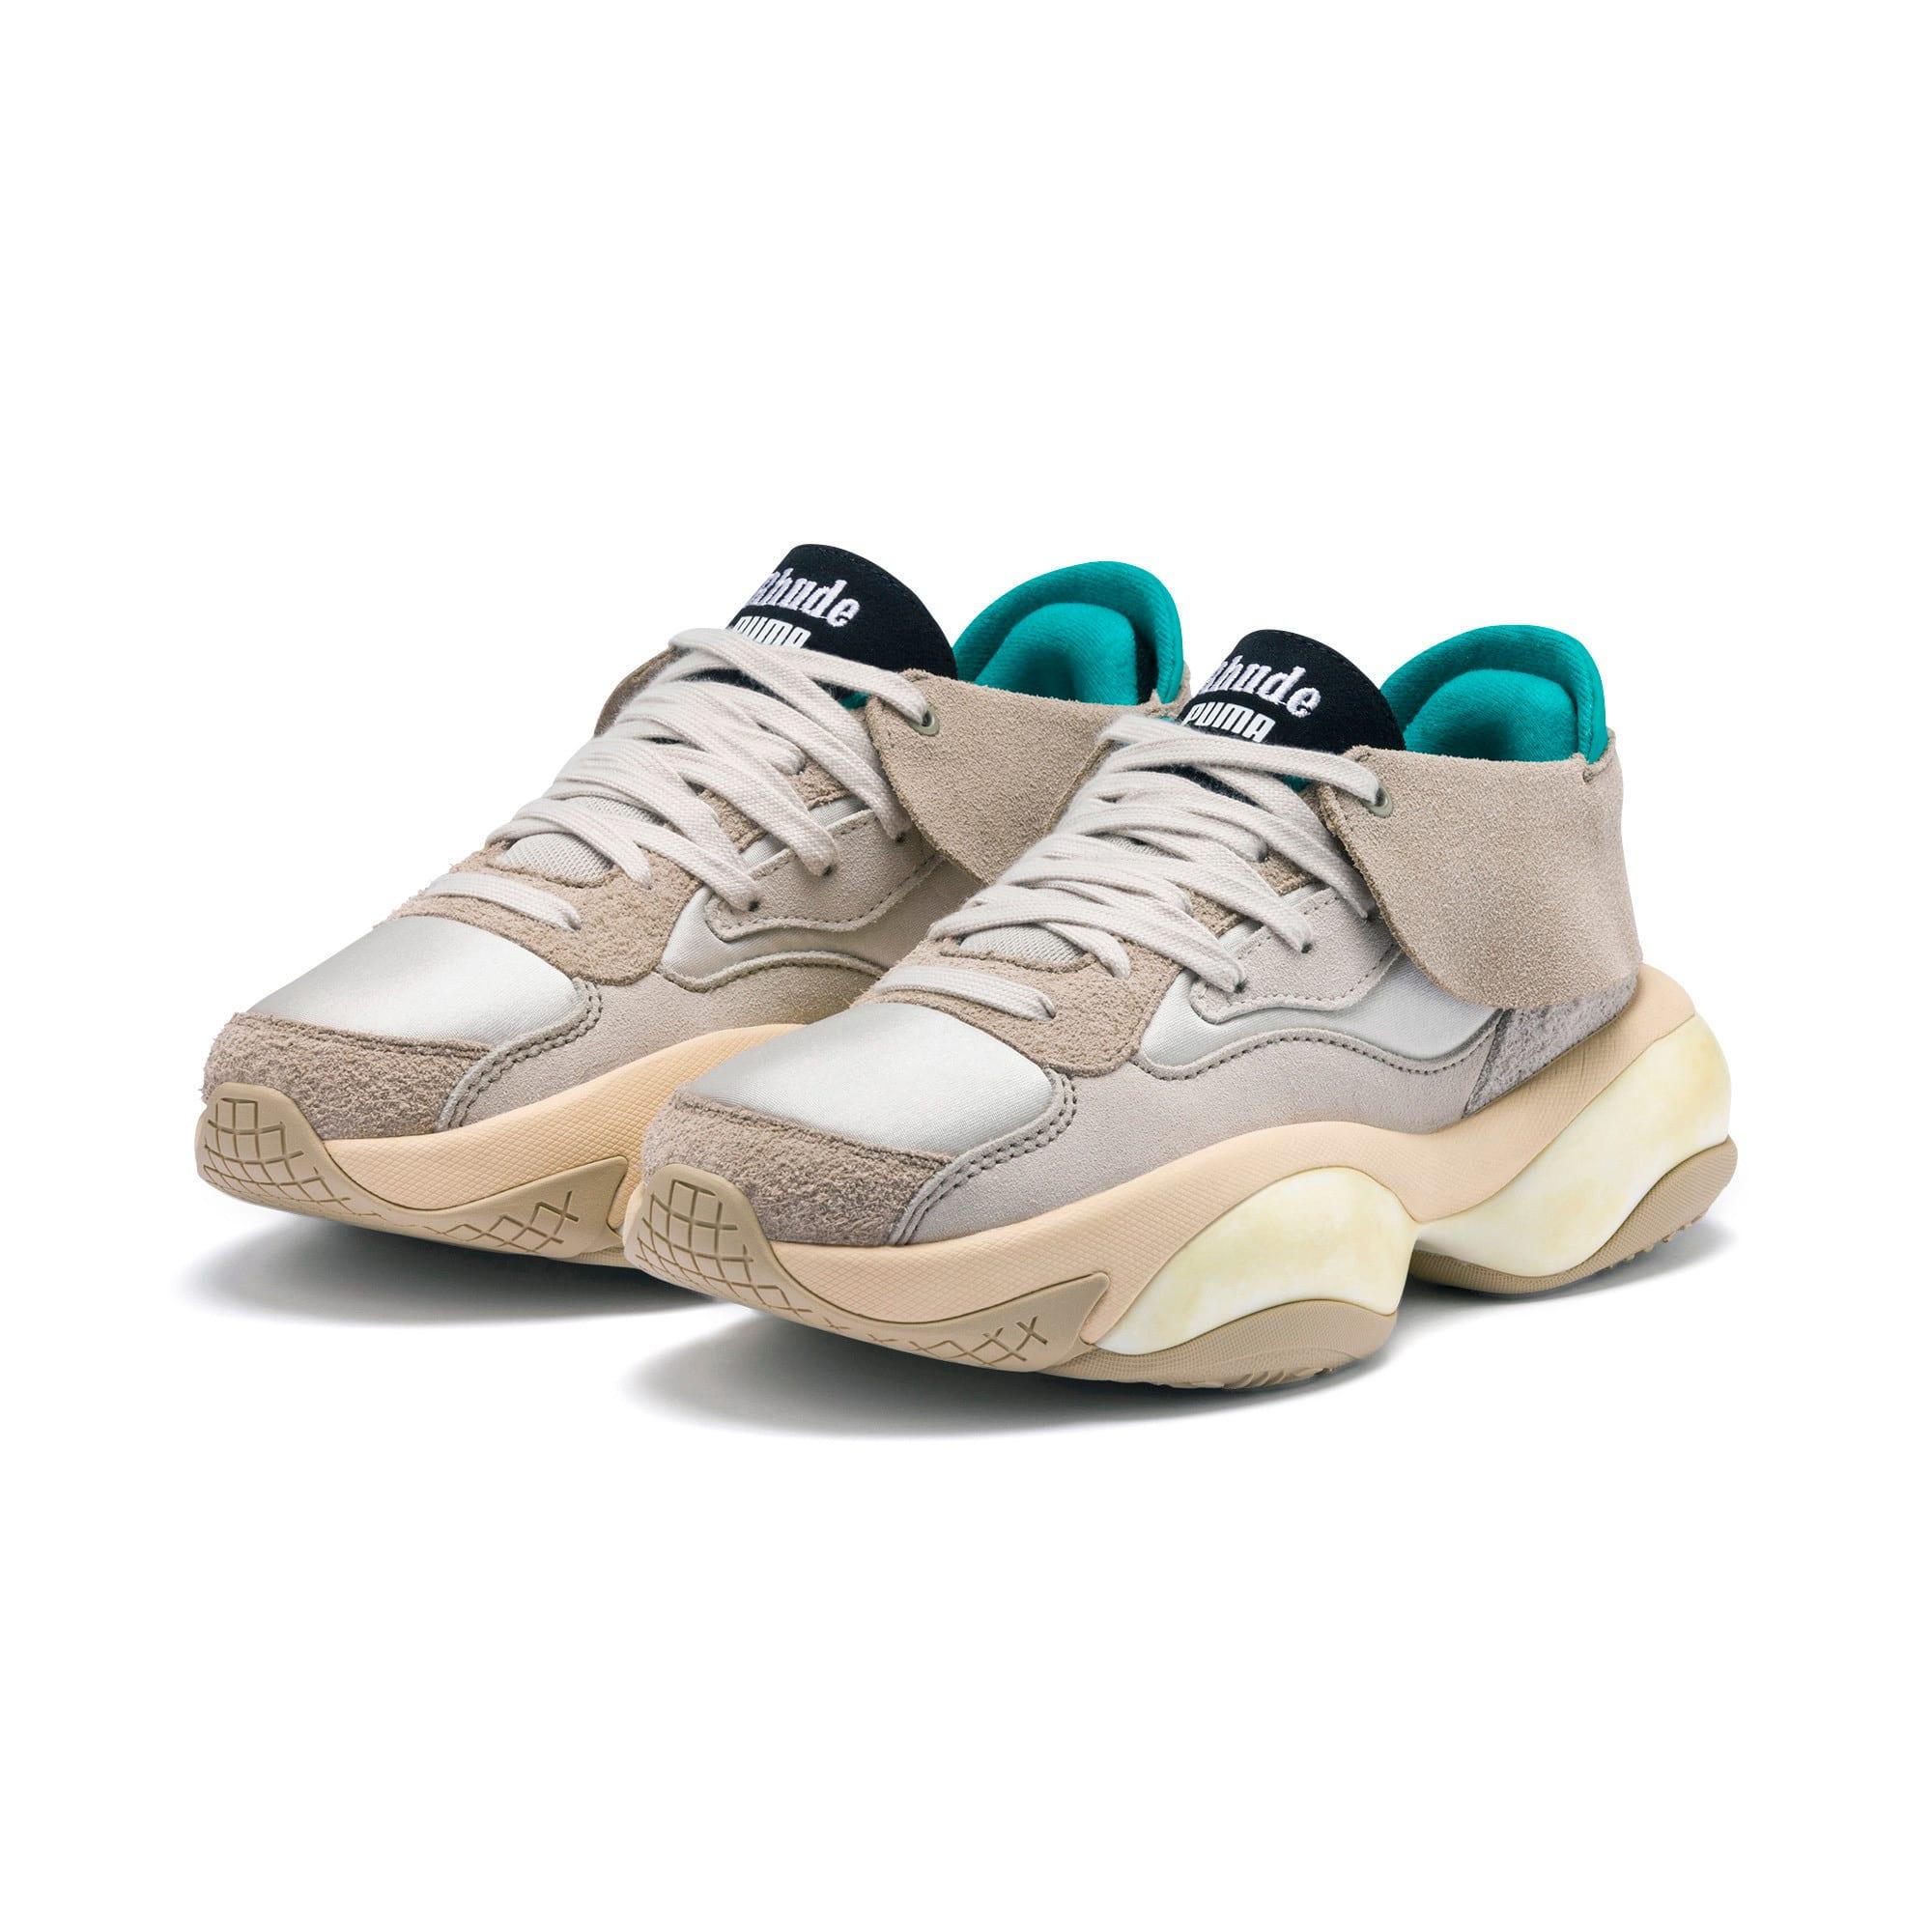 Thumbnail 2 of PUMA x RHUDE Alteration Sneakers, Chinchilla-Whisper White, medium